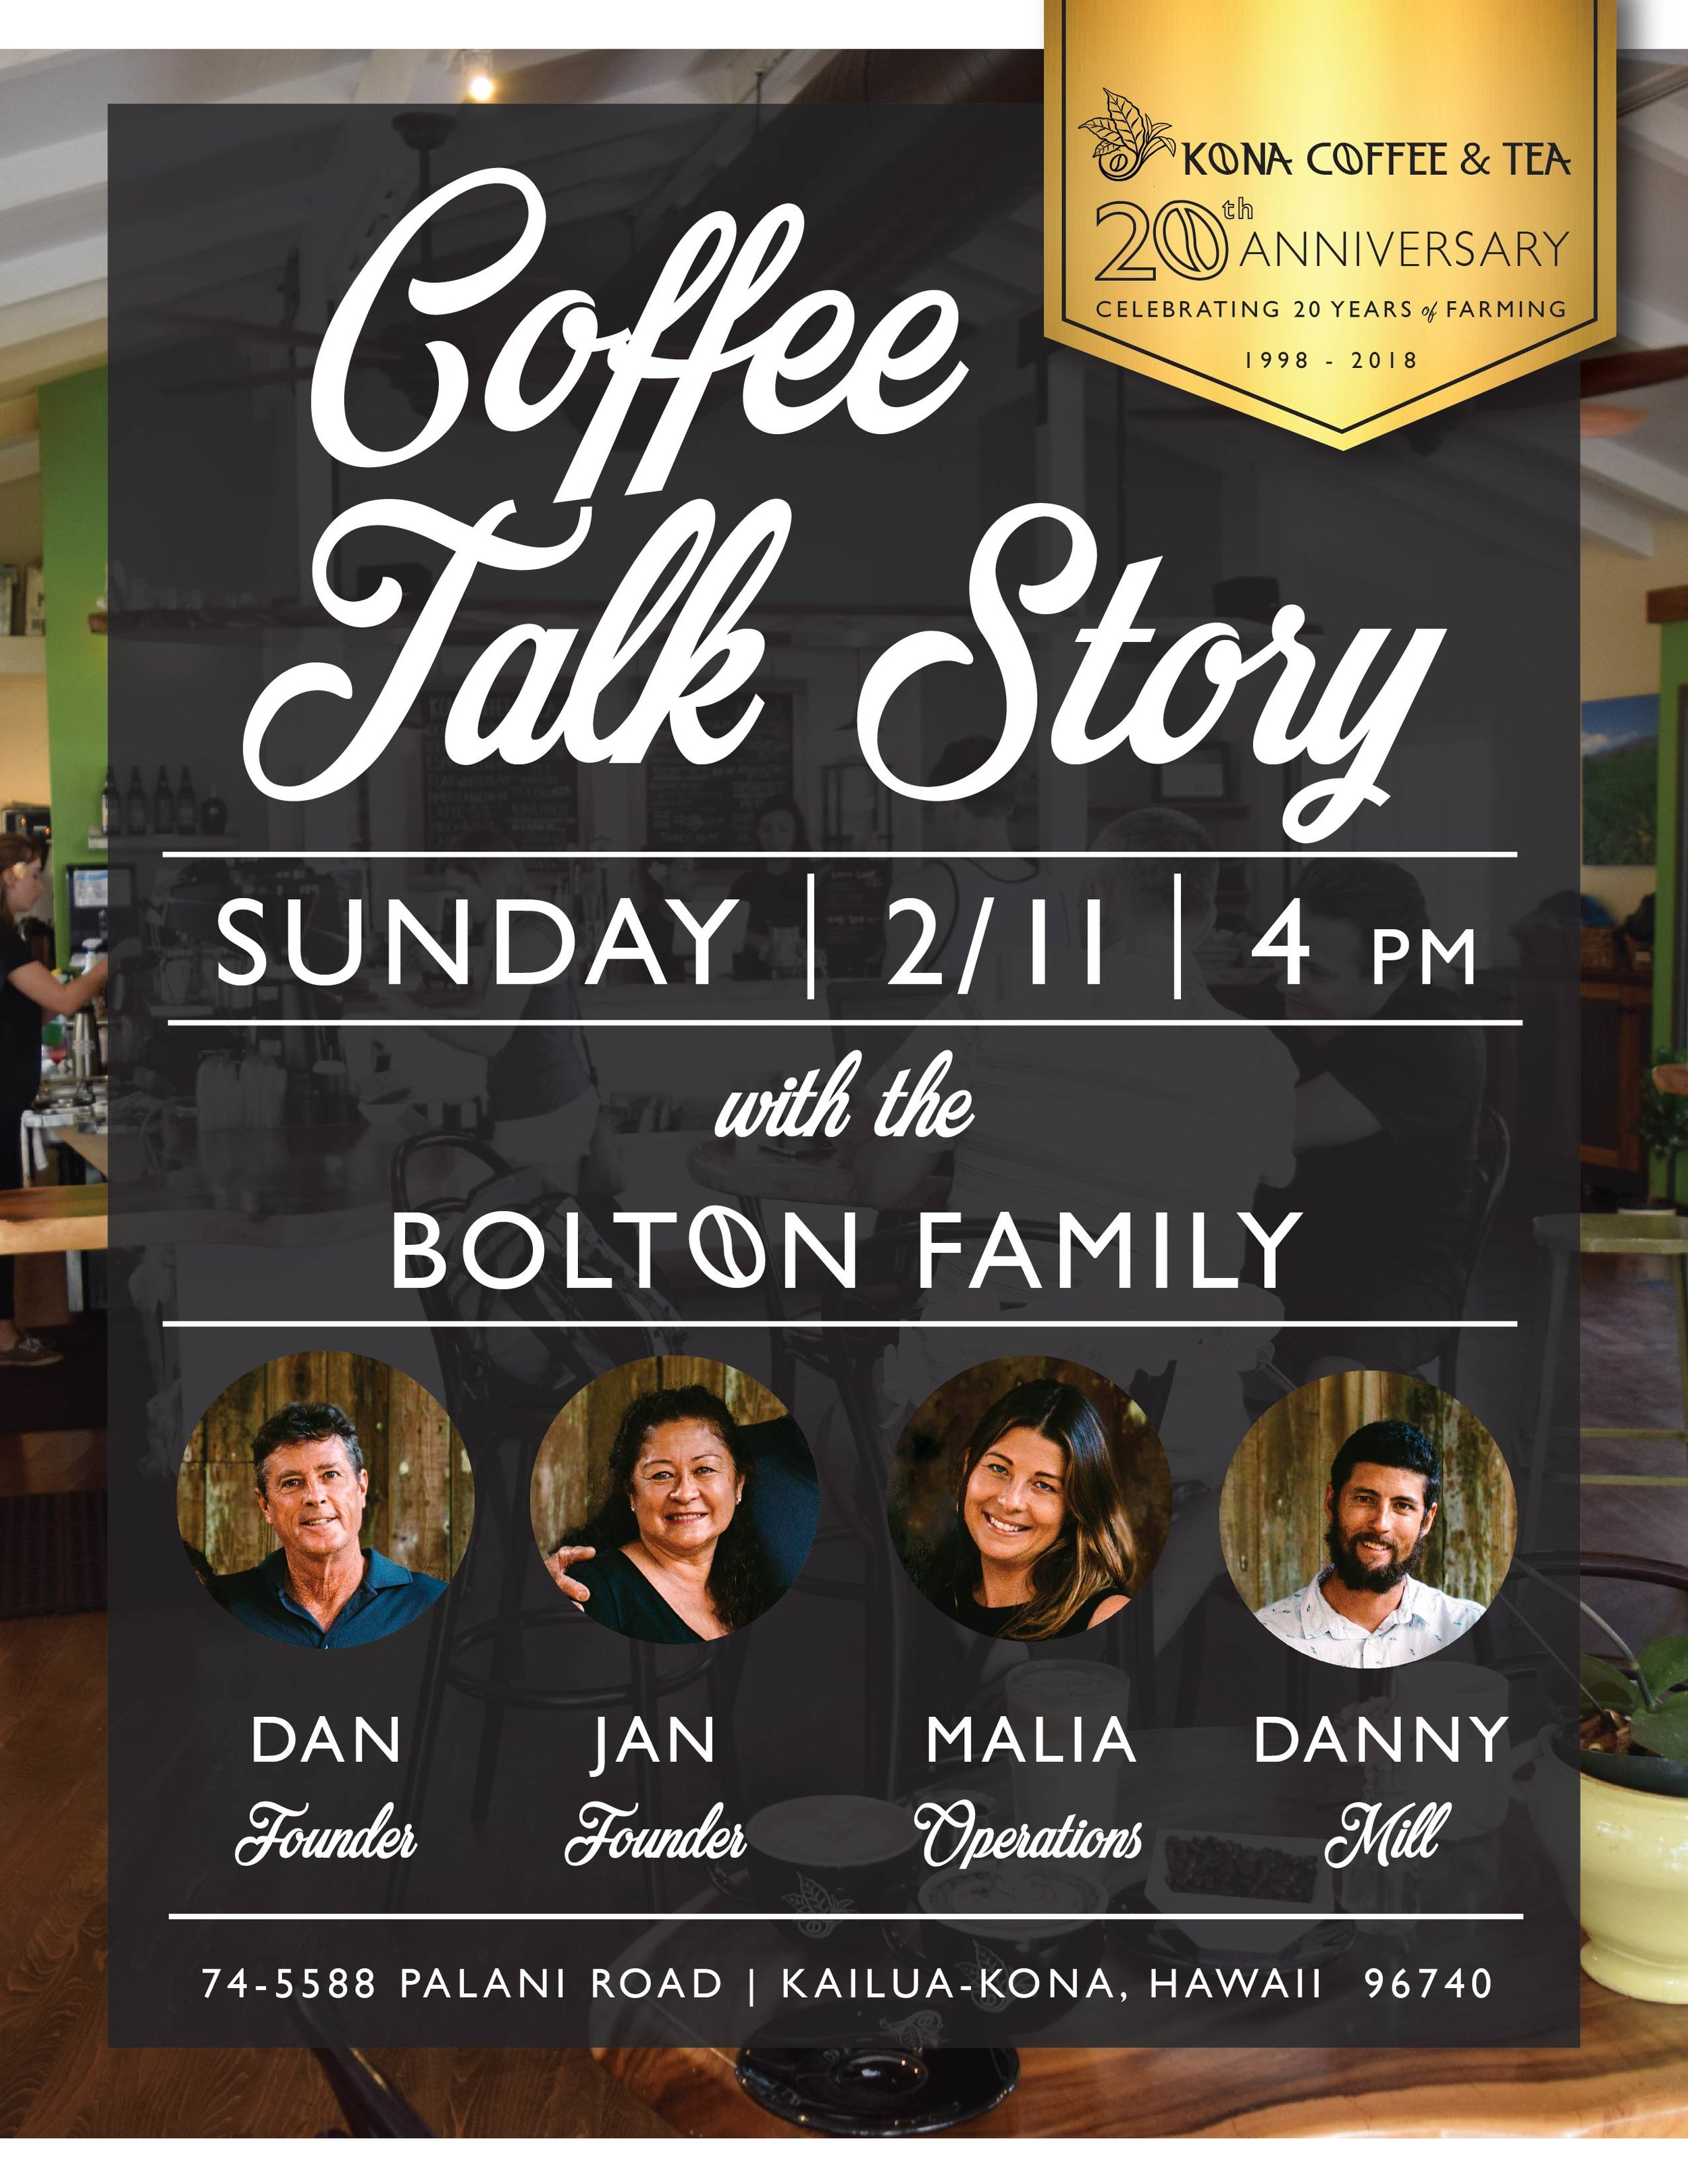 Bolton Family Talk Story_2.11.18-01-01.jpg